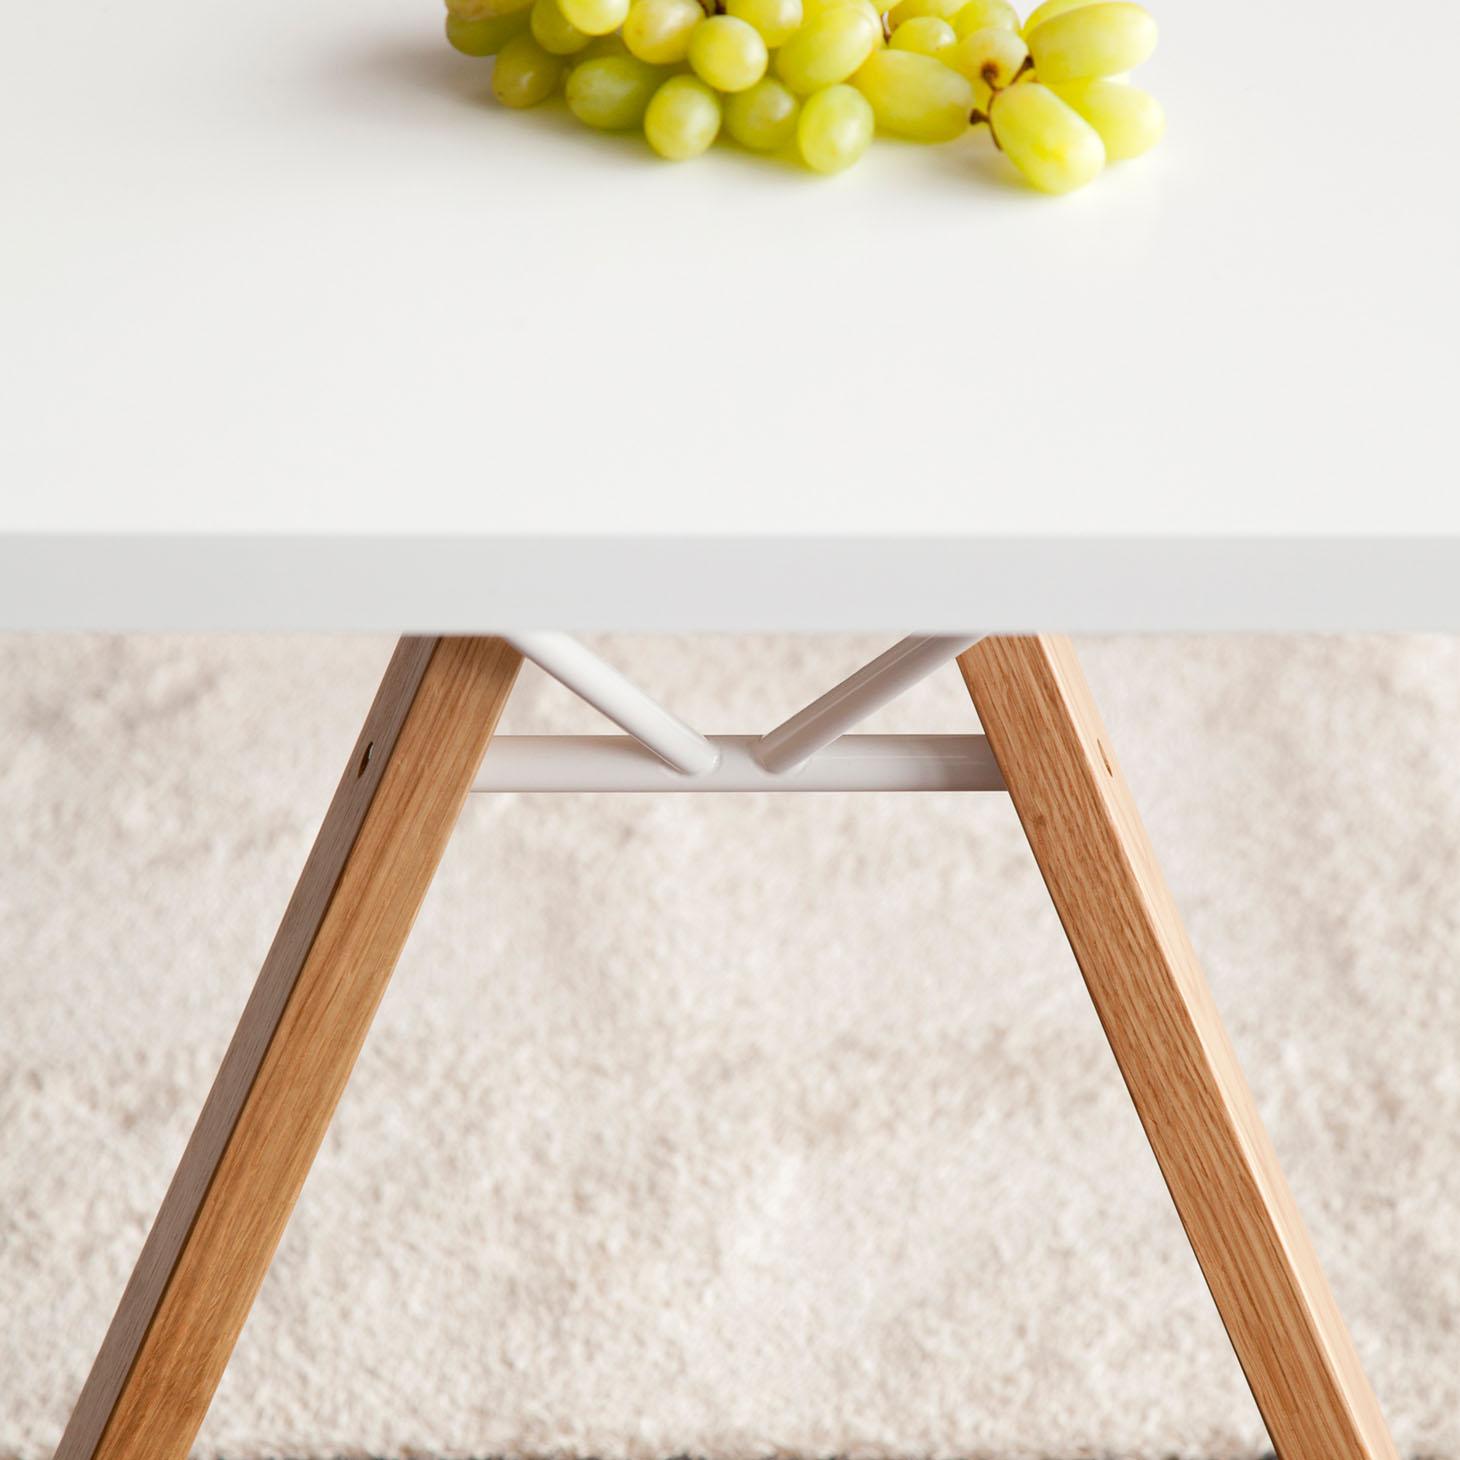 Lab table